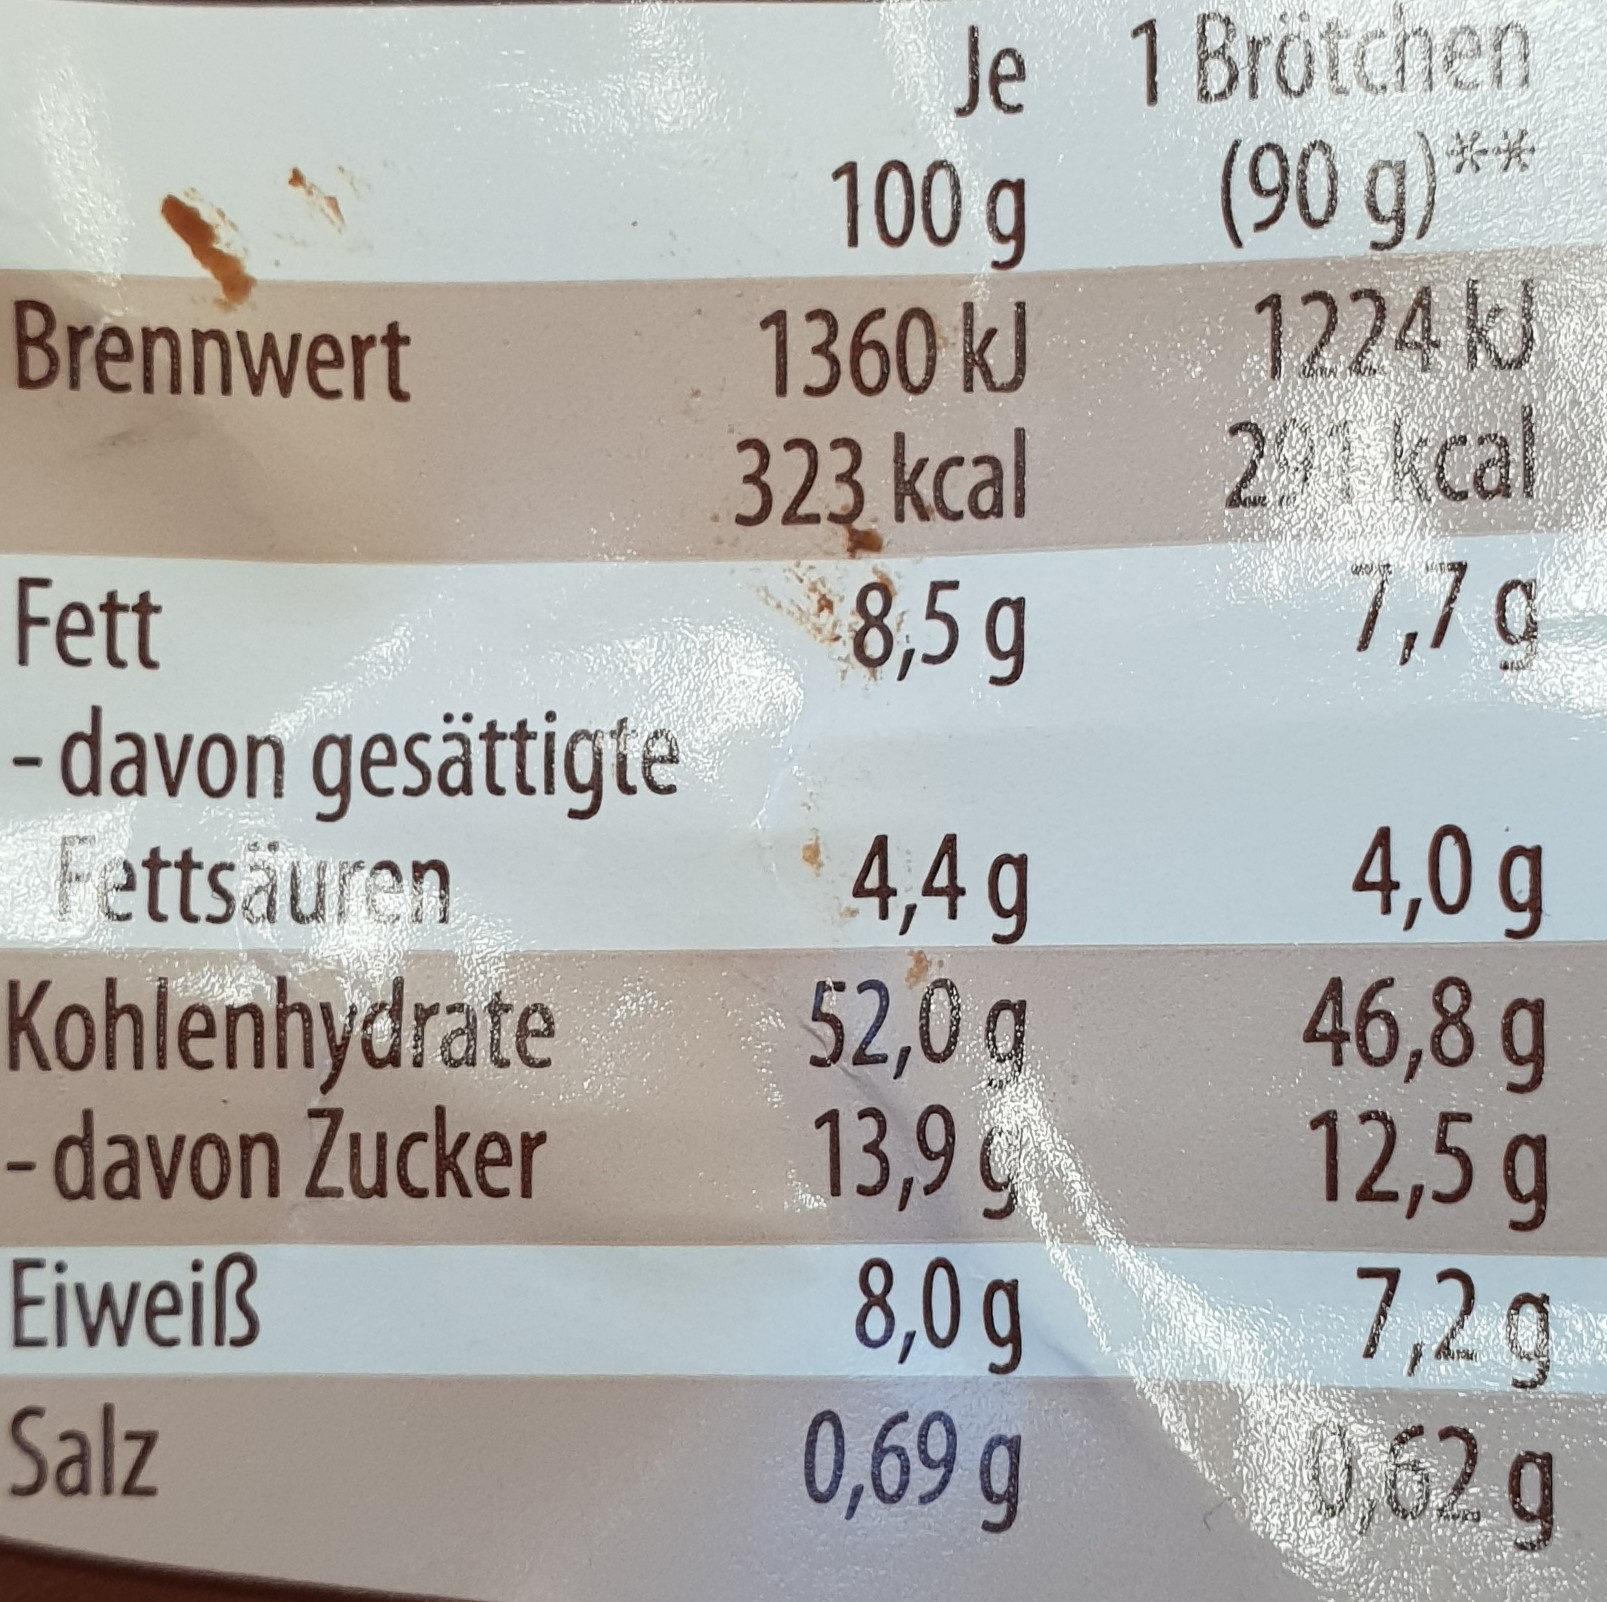 Schokobrötchen - Nutrition facts